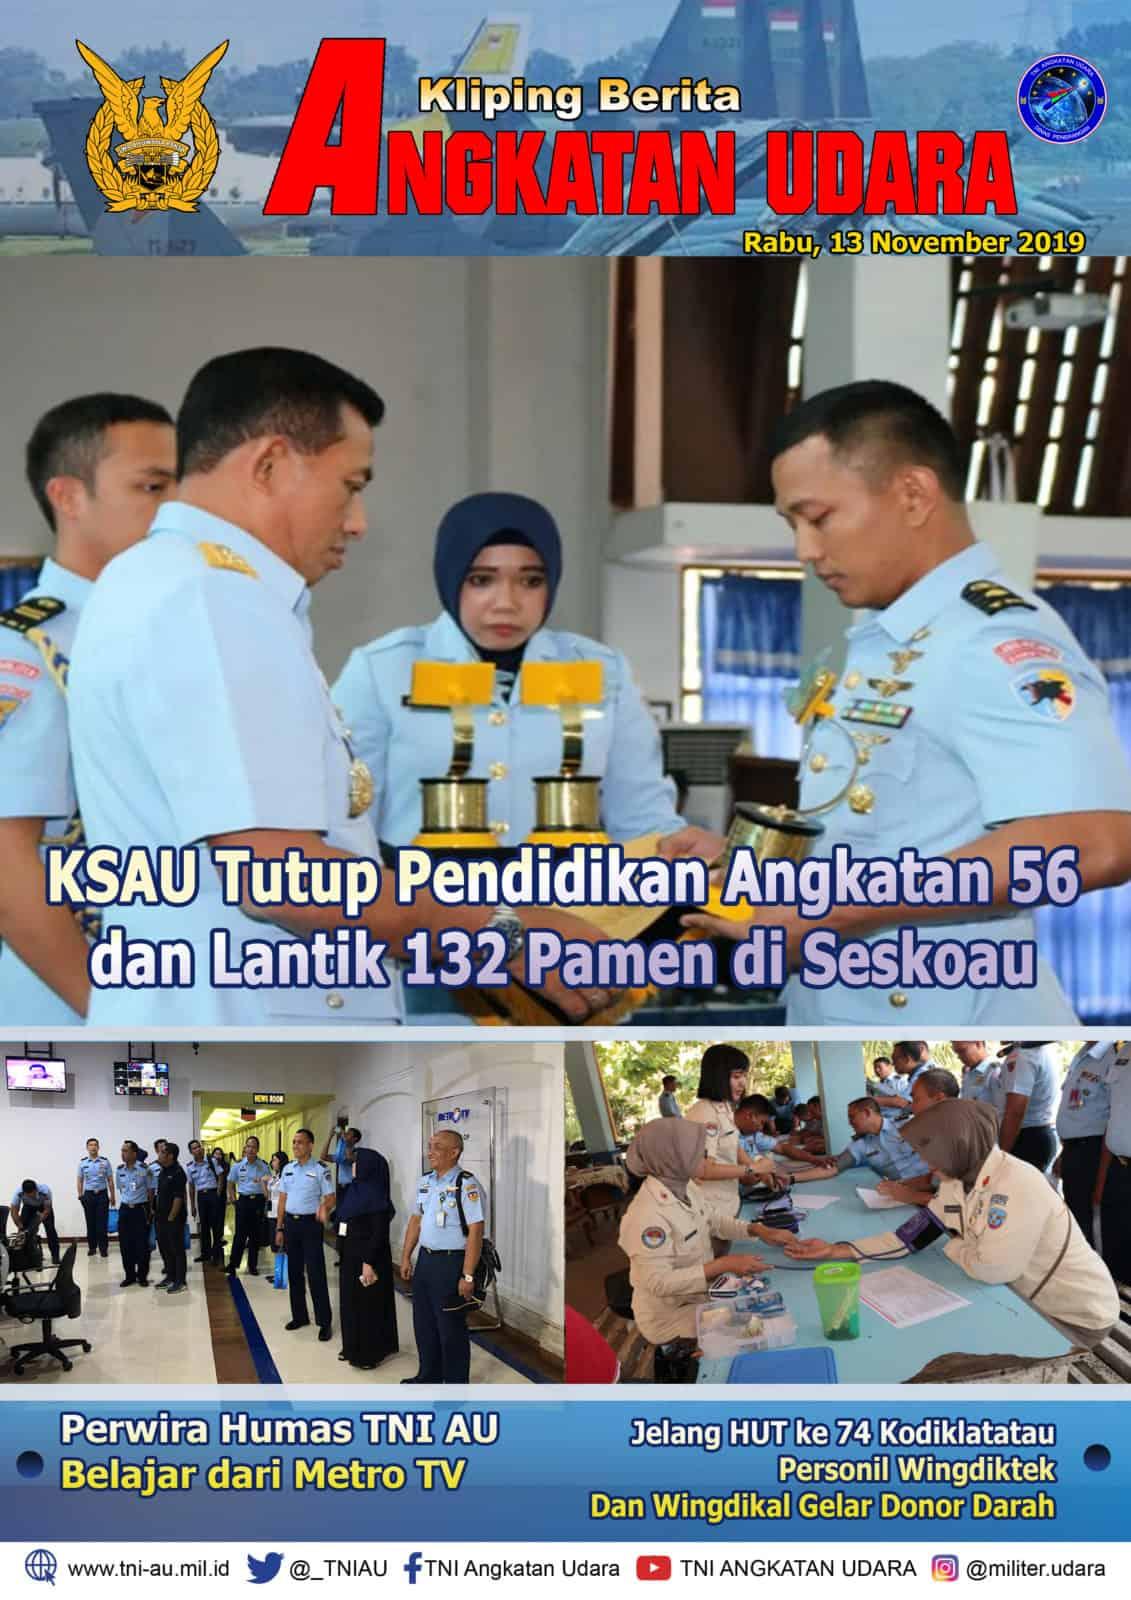 Kliping Berita Media 13 November 2019